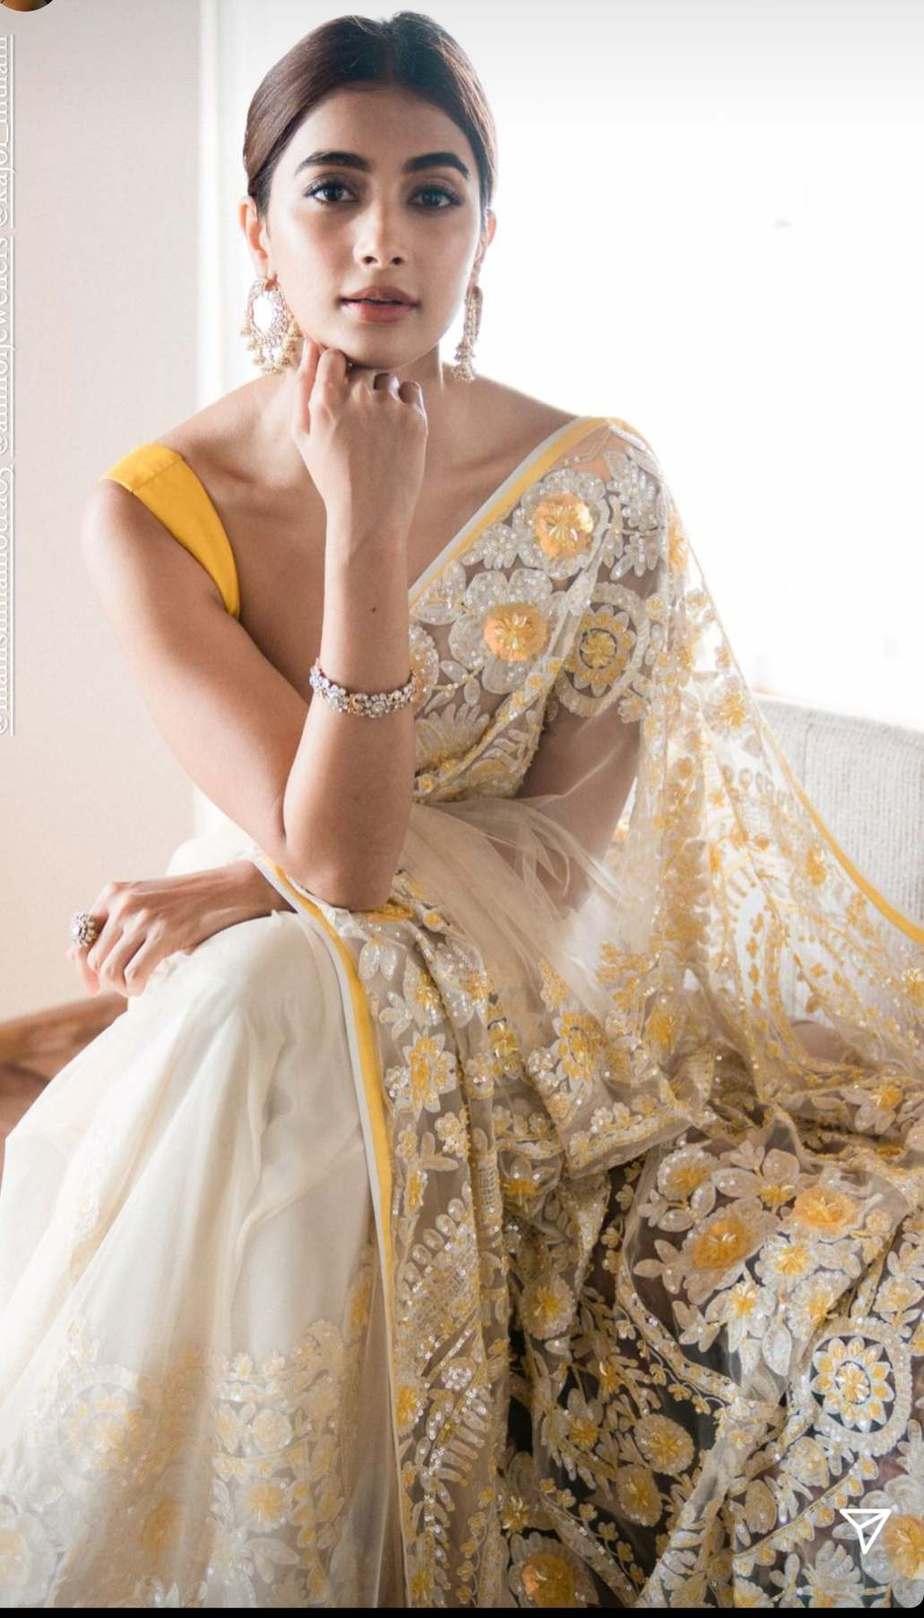 Pooja Hegde in a manish malhotra saree-1